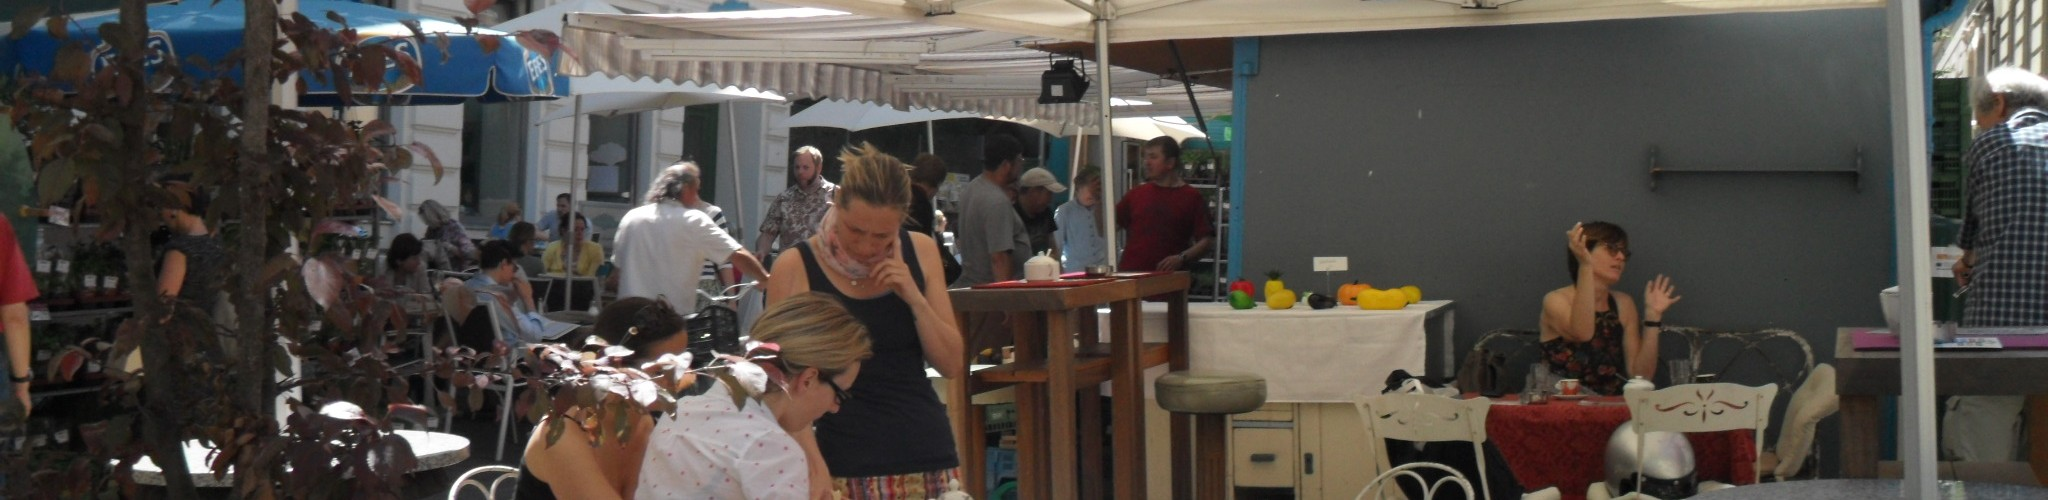 Kutschkermarkt Wien Maggies Genussgalerie